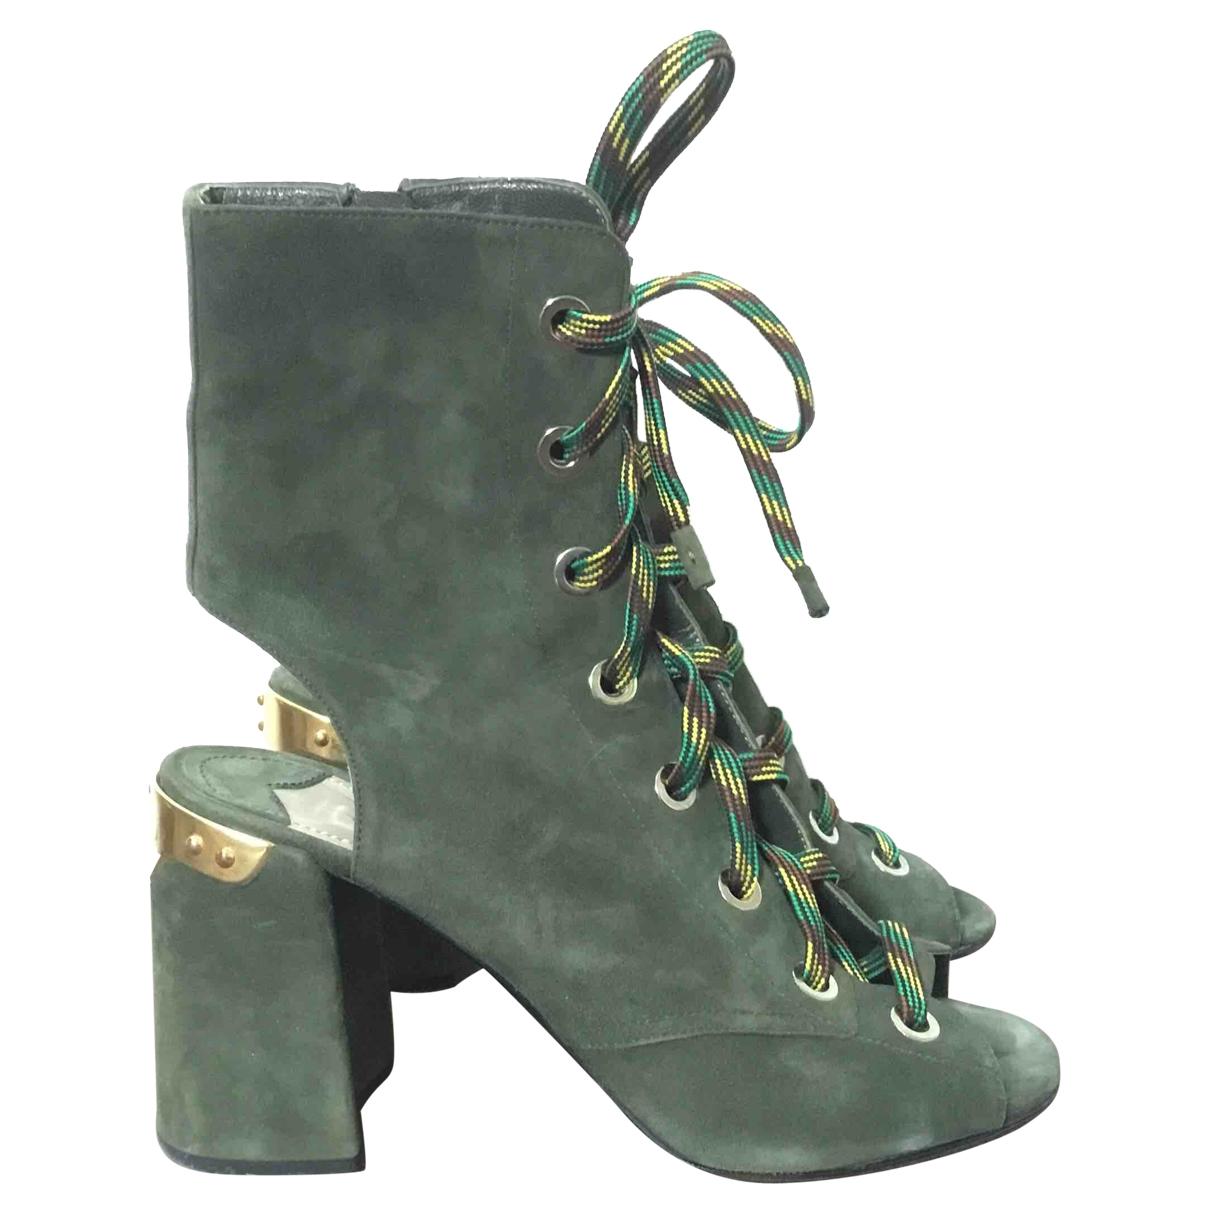 Prada \N Green Suede Sandals for Women 39 EU